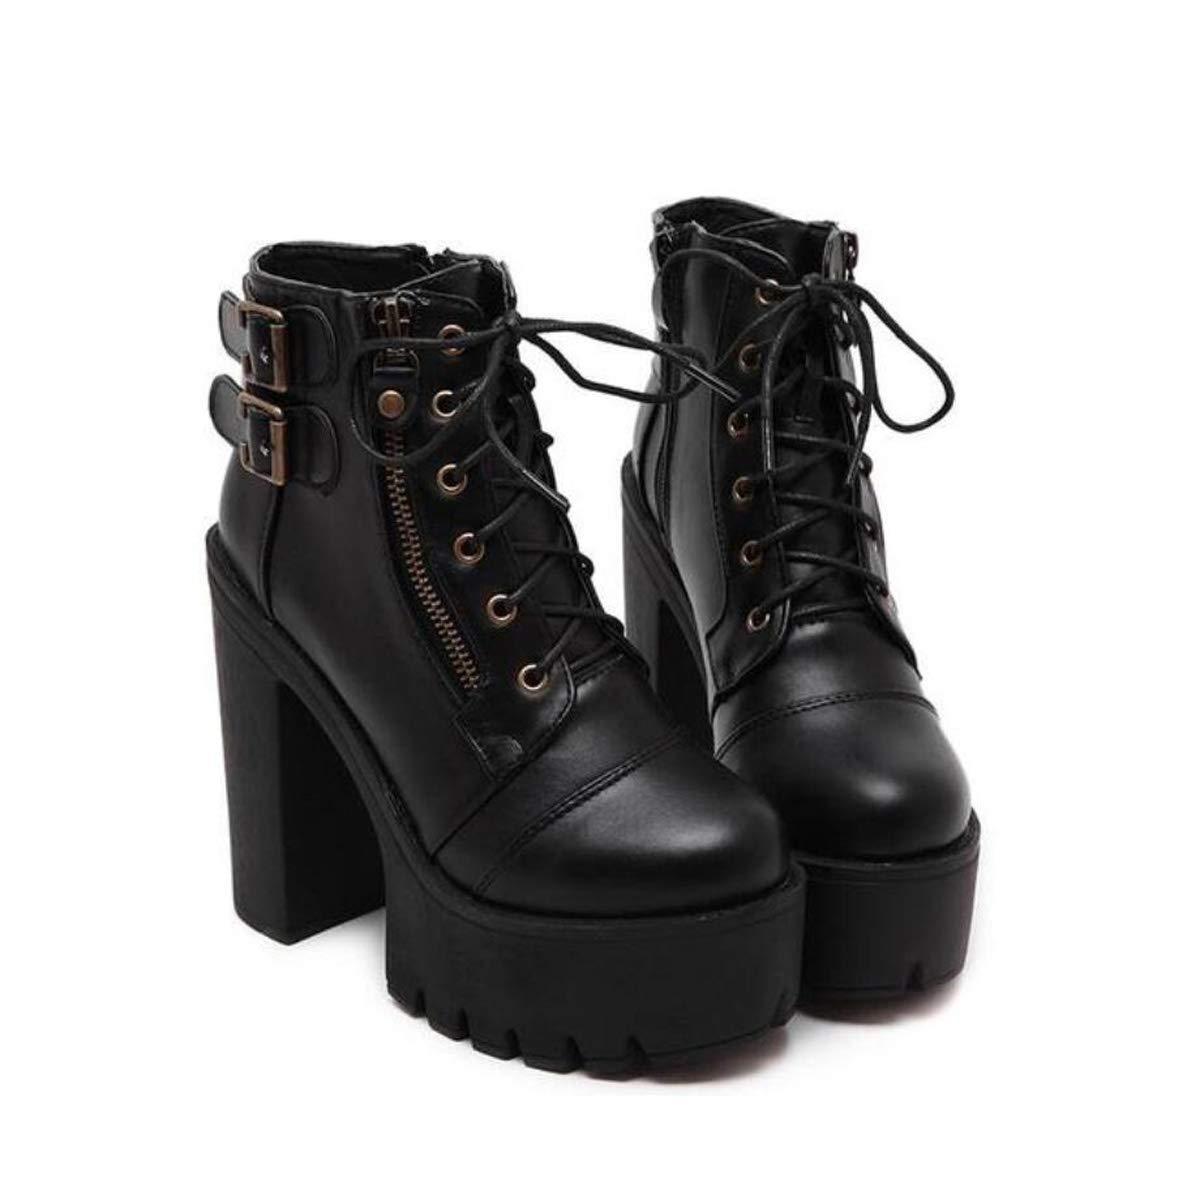 DANDANJIE Damen Plateaustiefel Super High Heel Schuhe Zip Chunky High Heel Pumps für den Herbst,schwarz,35EU